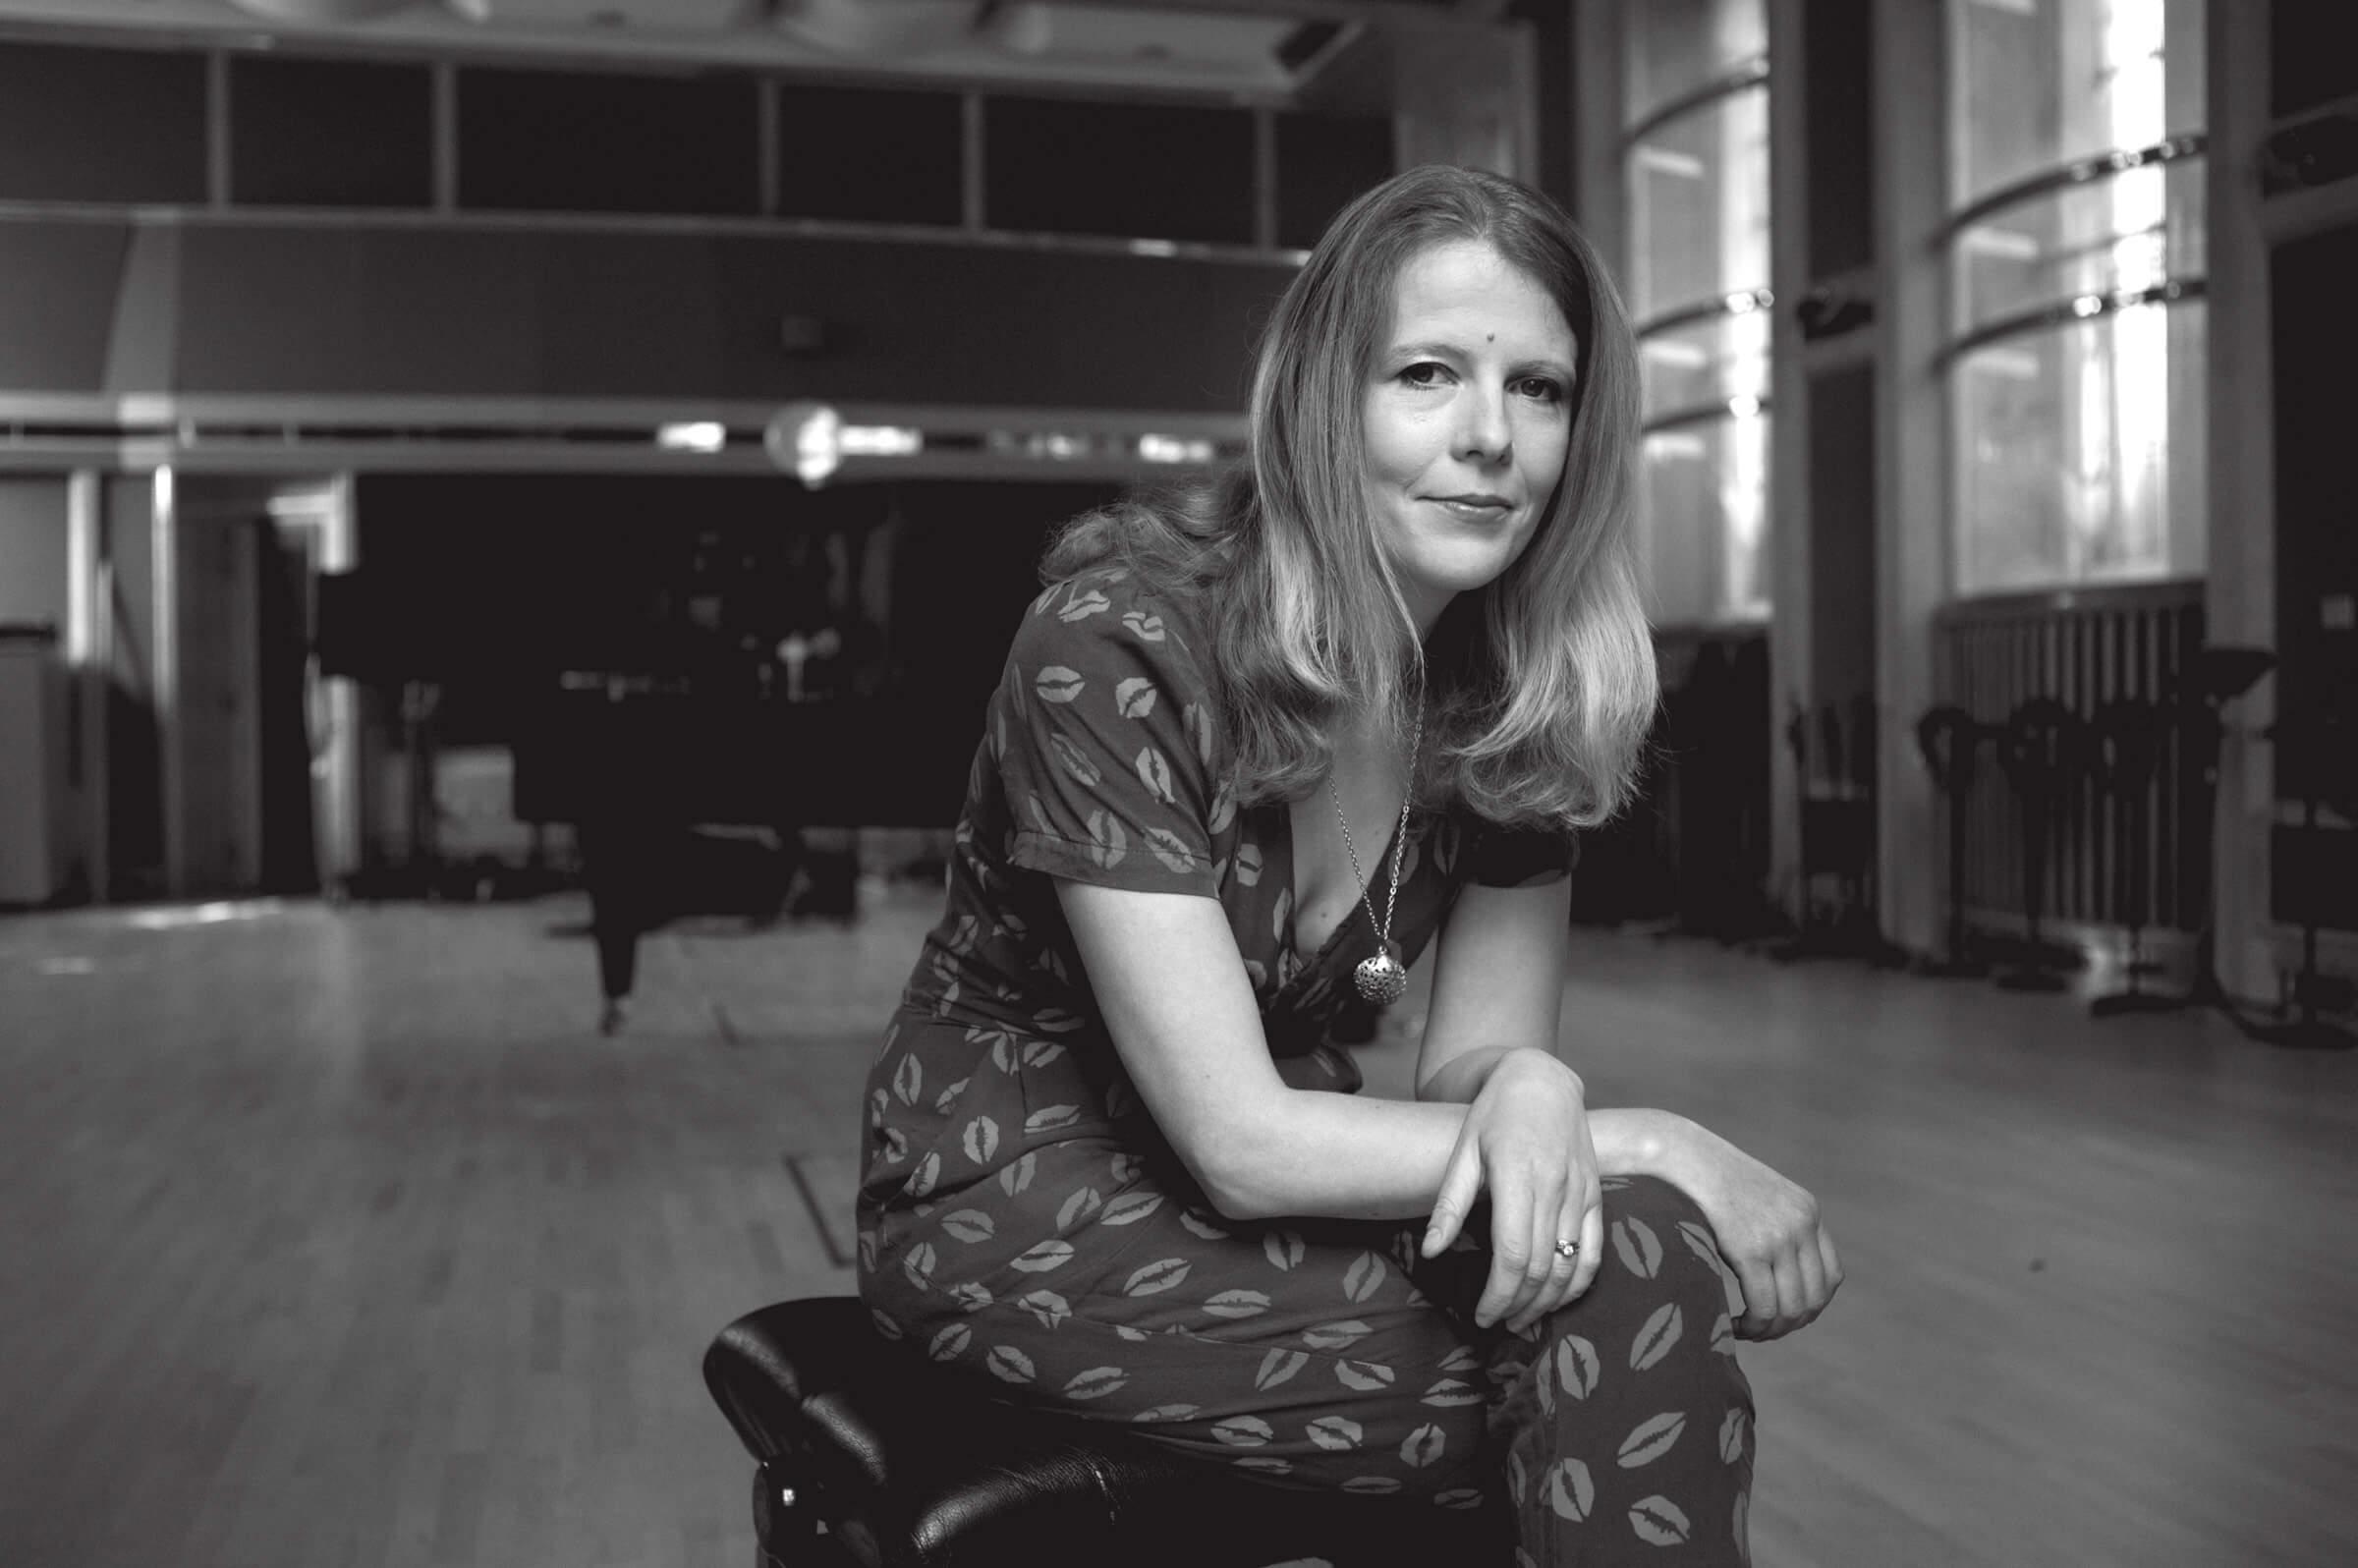 Olga FitzRoy